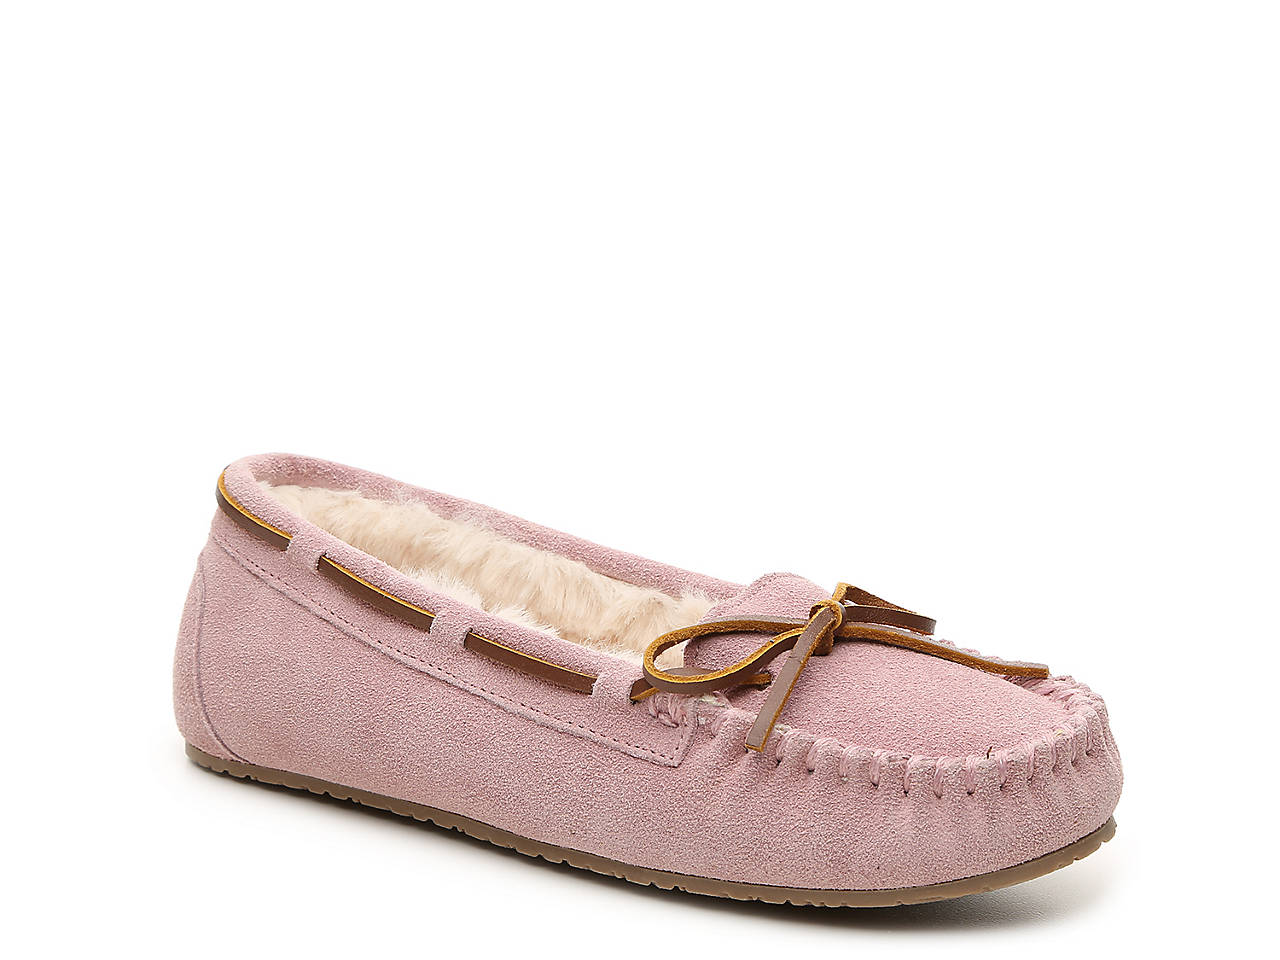 e77b982cb6ba Minnetonka Jr. Trapper Moccasin Slipper Women s Shoes